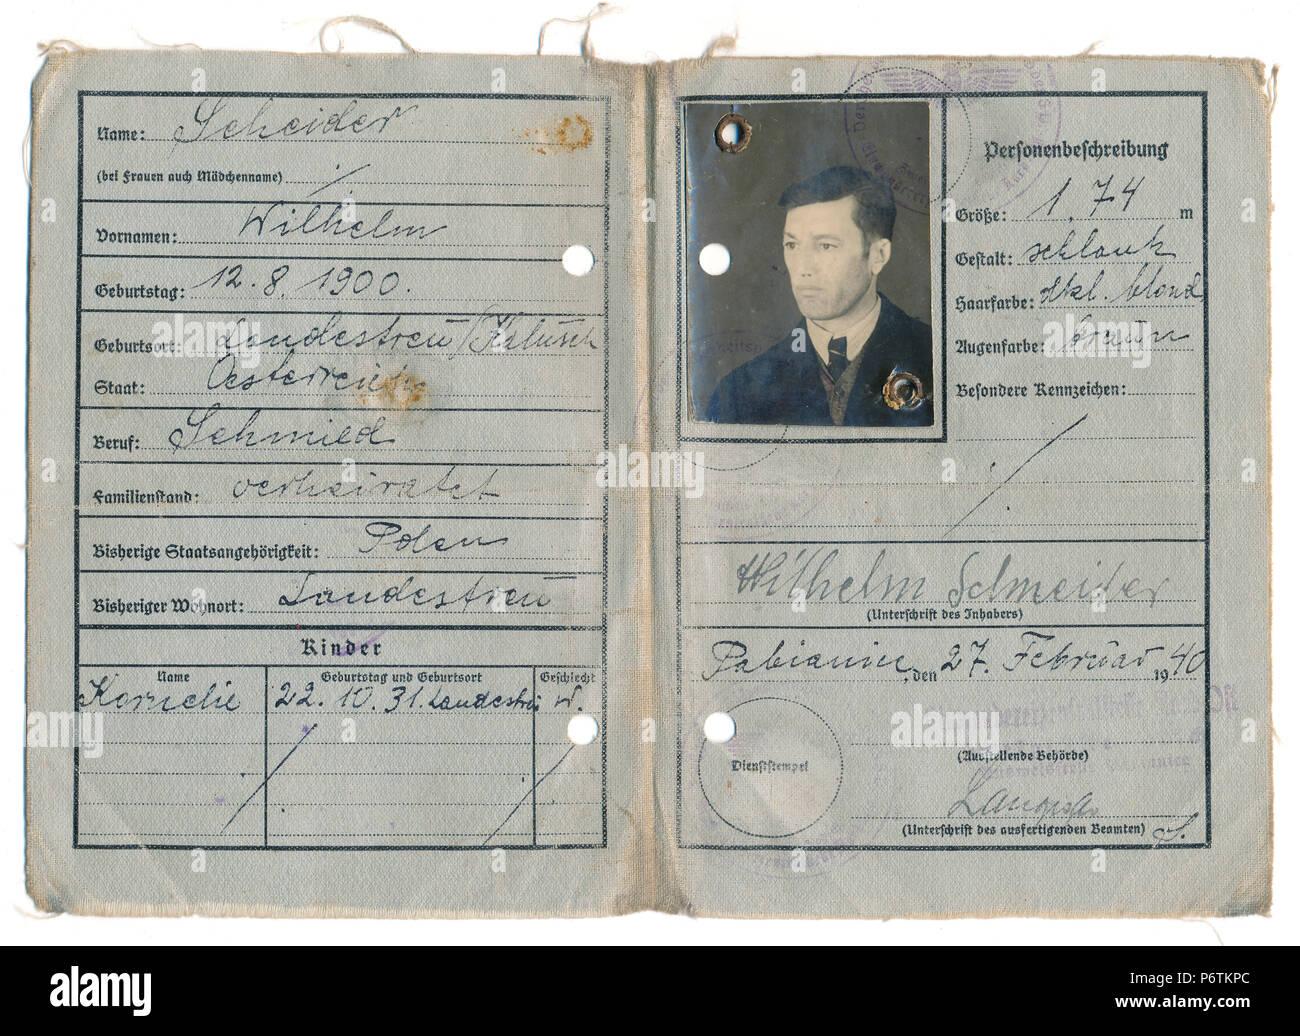 Old passport, 1940, German Empire, Europe - Stock Image